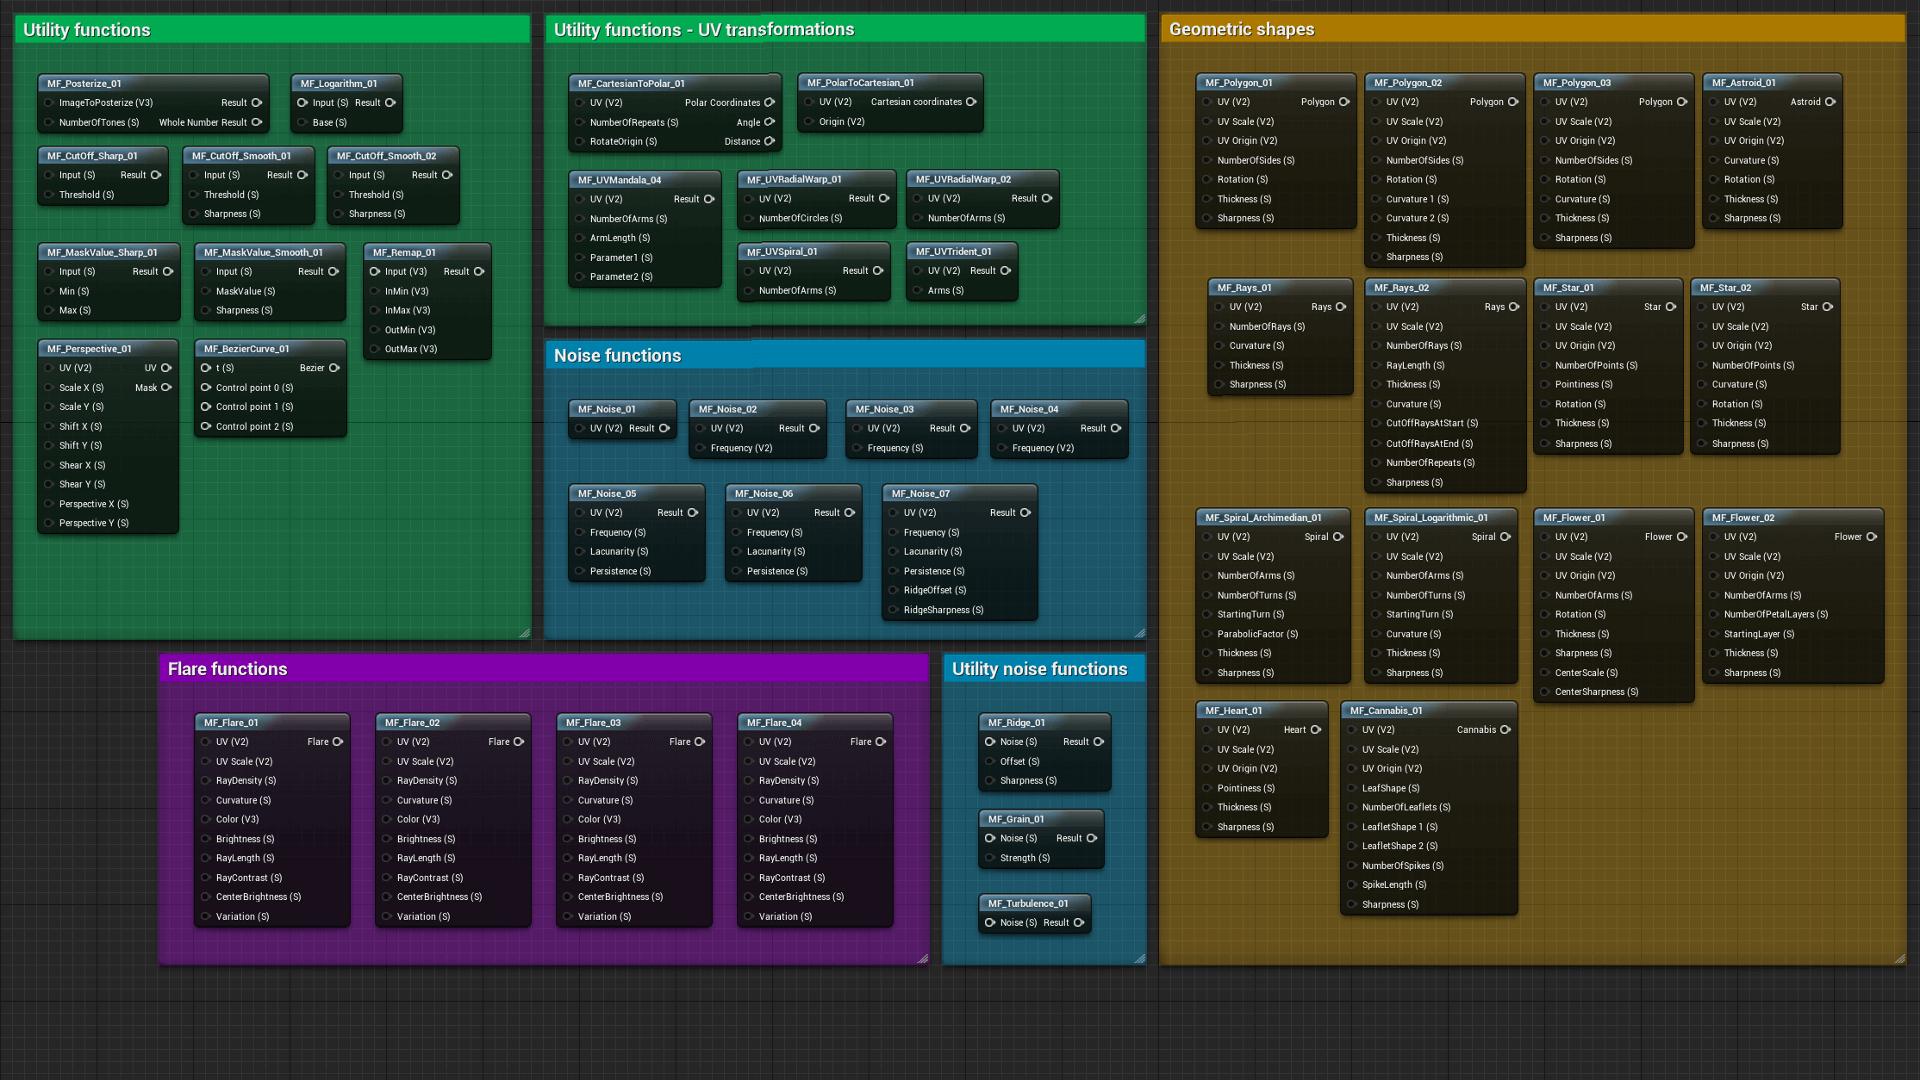 Fx options operations